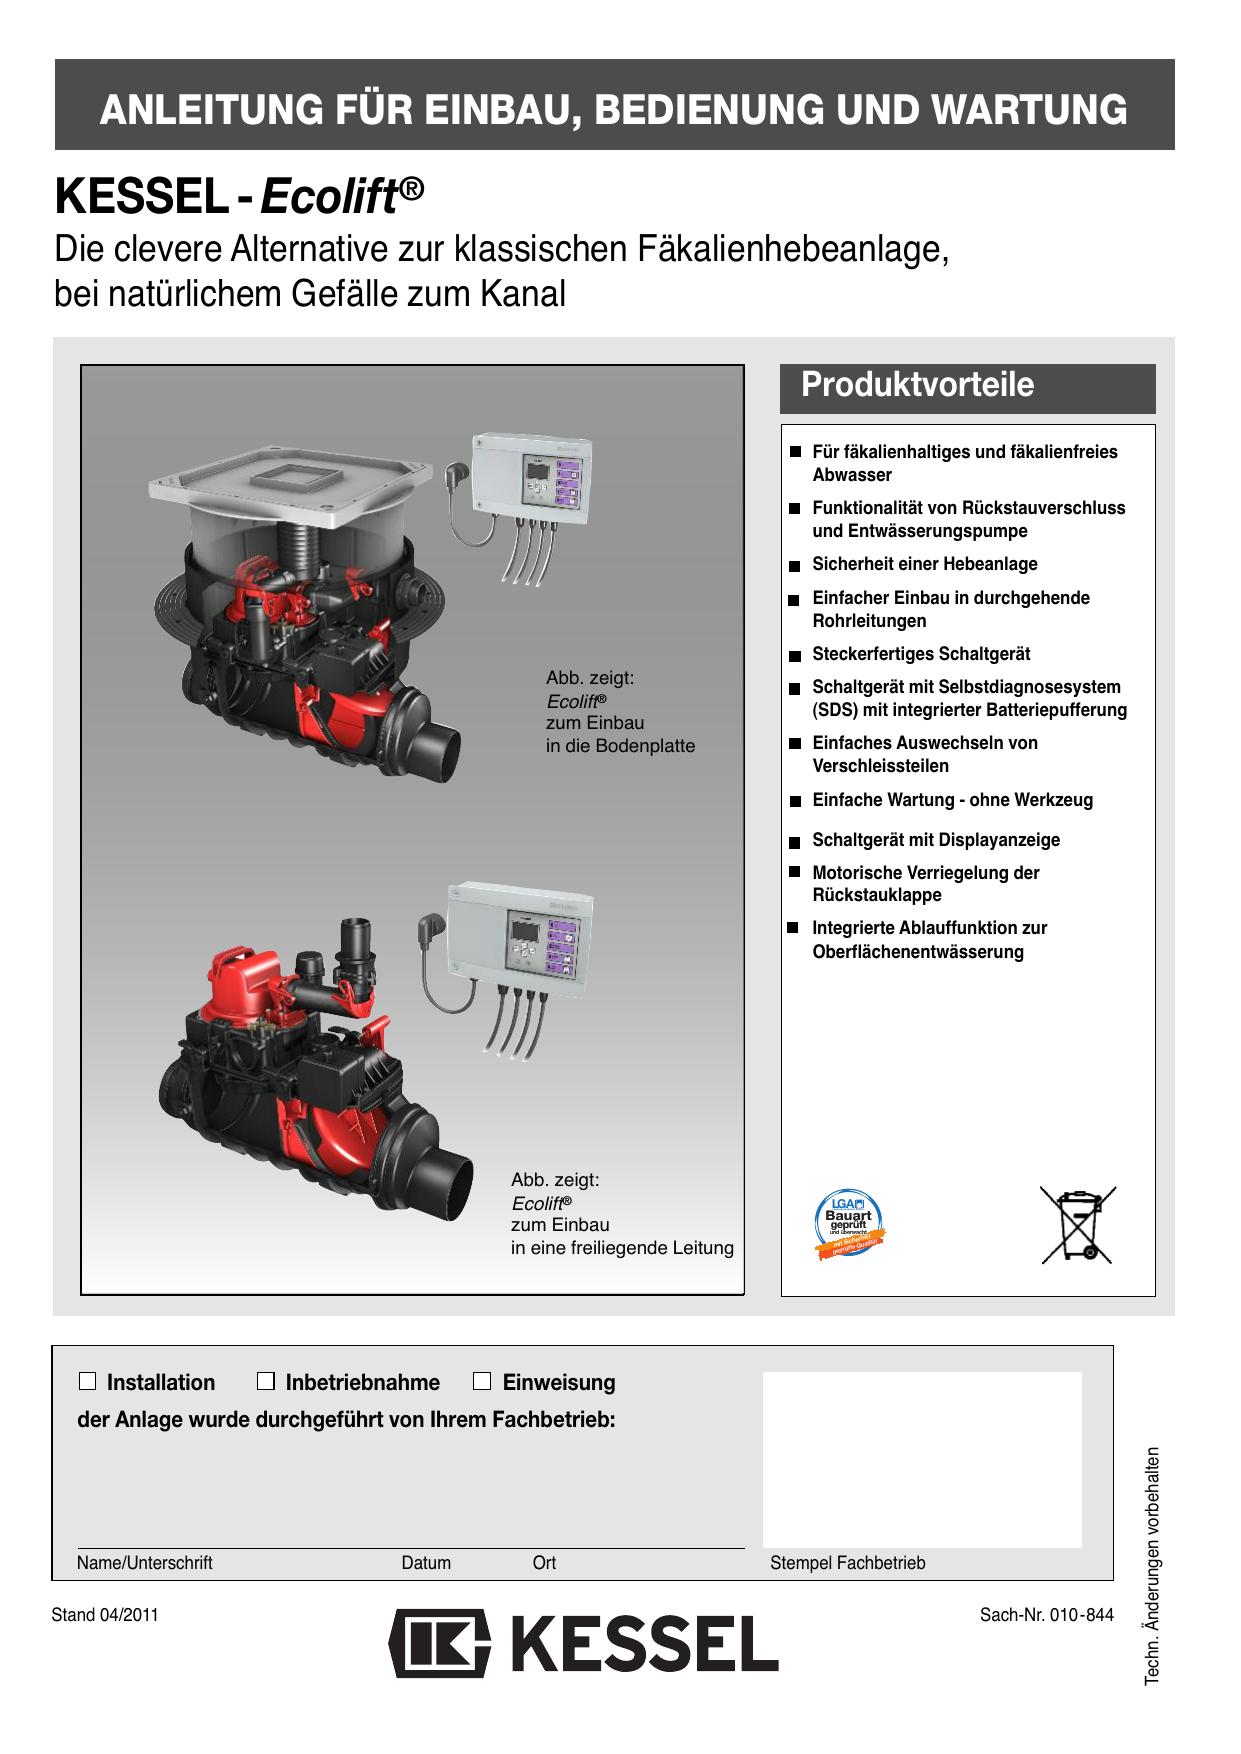 KESSEL-Ecolift®   manualzz.com